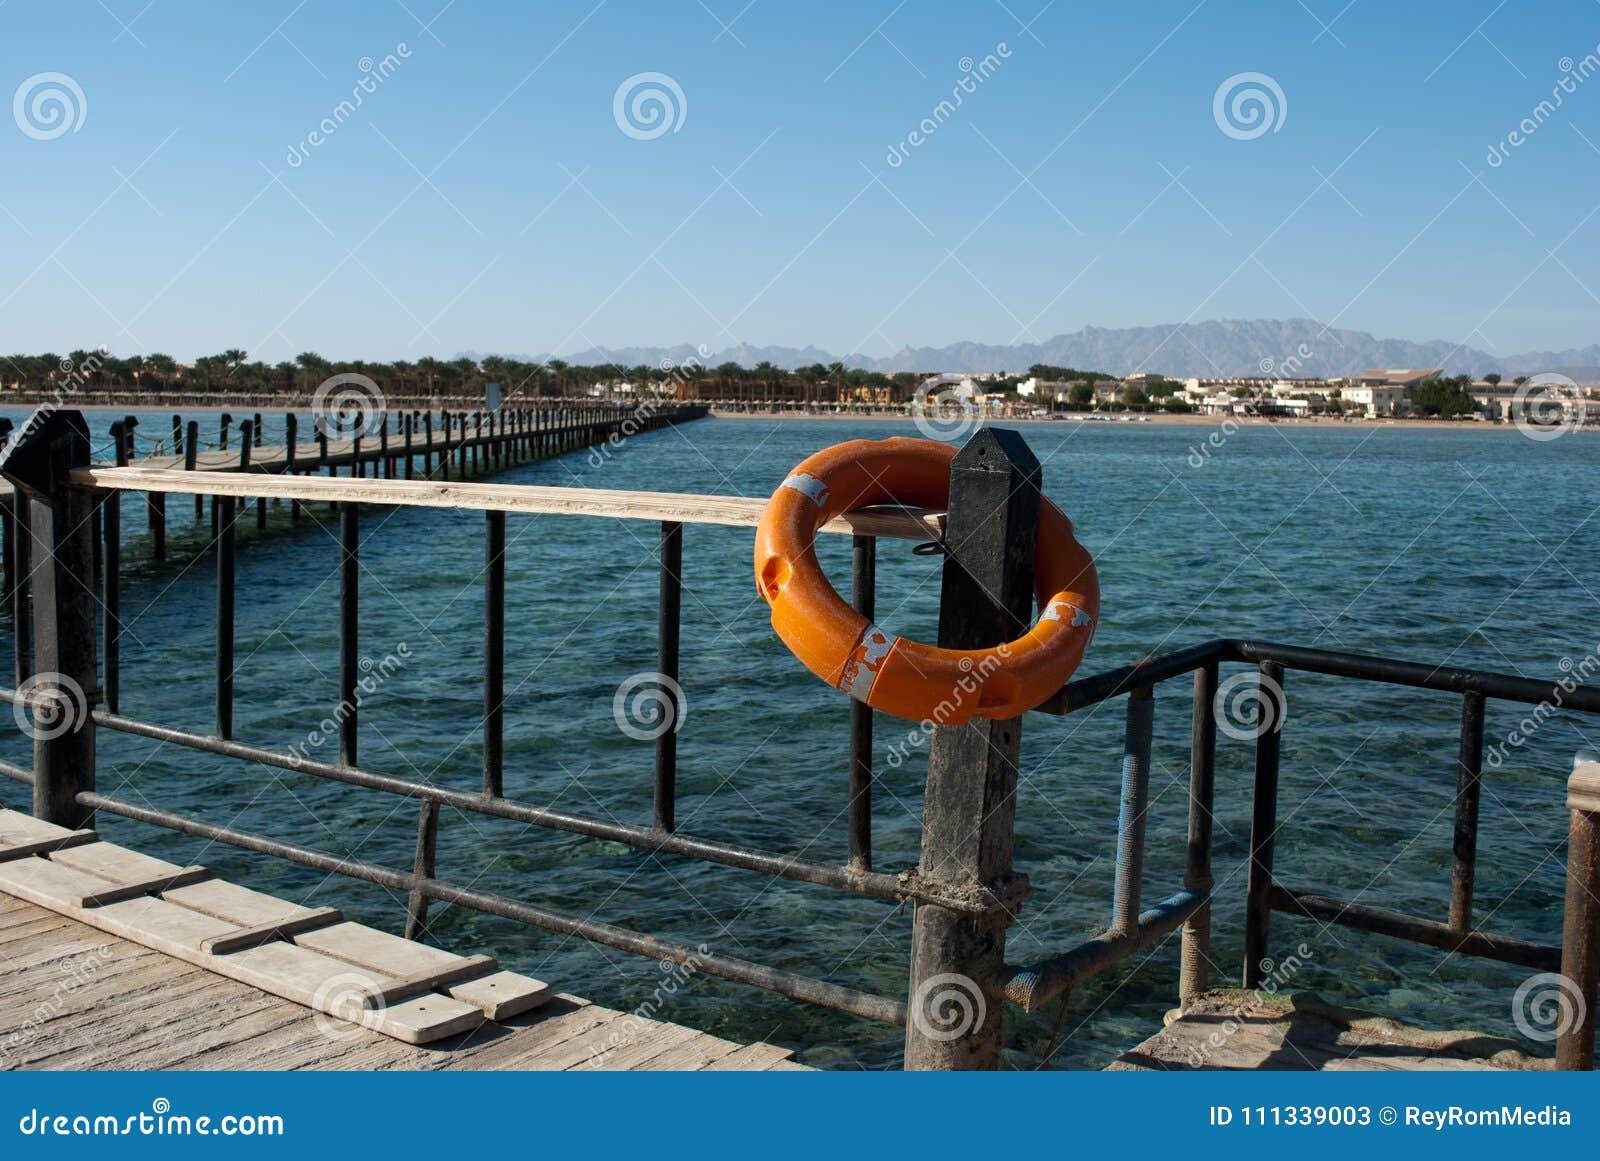 Reddingsboei en pijler Oranje reddingsboei op barrièrepijler Sparen reddingsboei en blauw water Veiligheidsmateriaal op dok voor